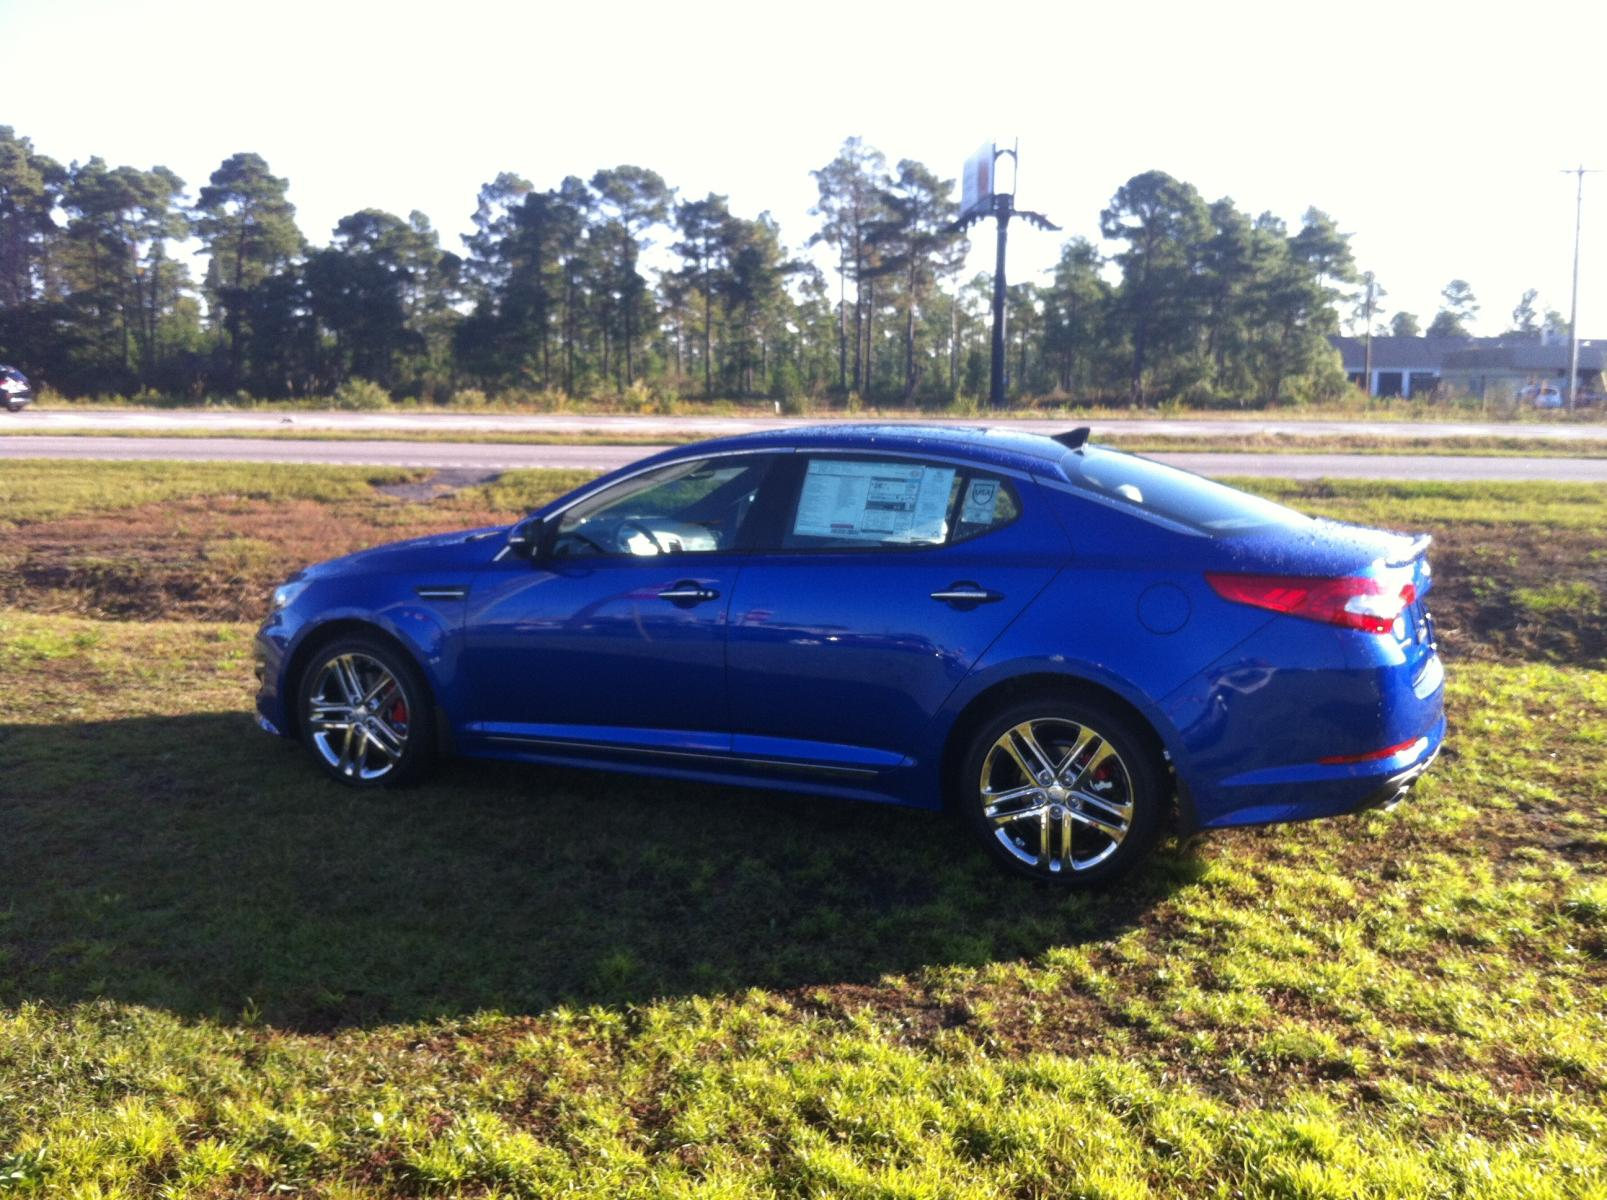 ... New Kia Dealer Myrtle Beach South Carolina Lots Of SXu0027s Img_0976